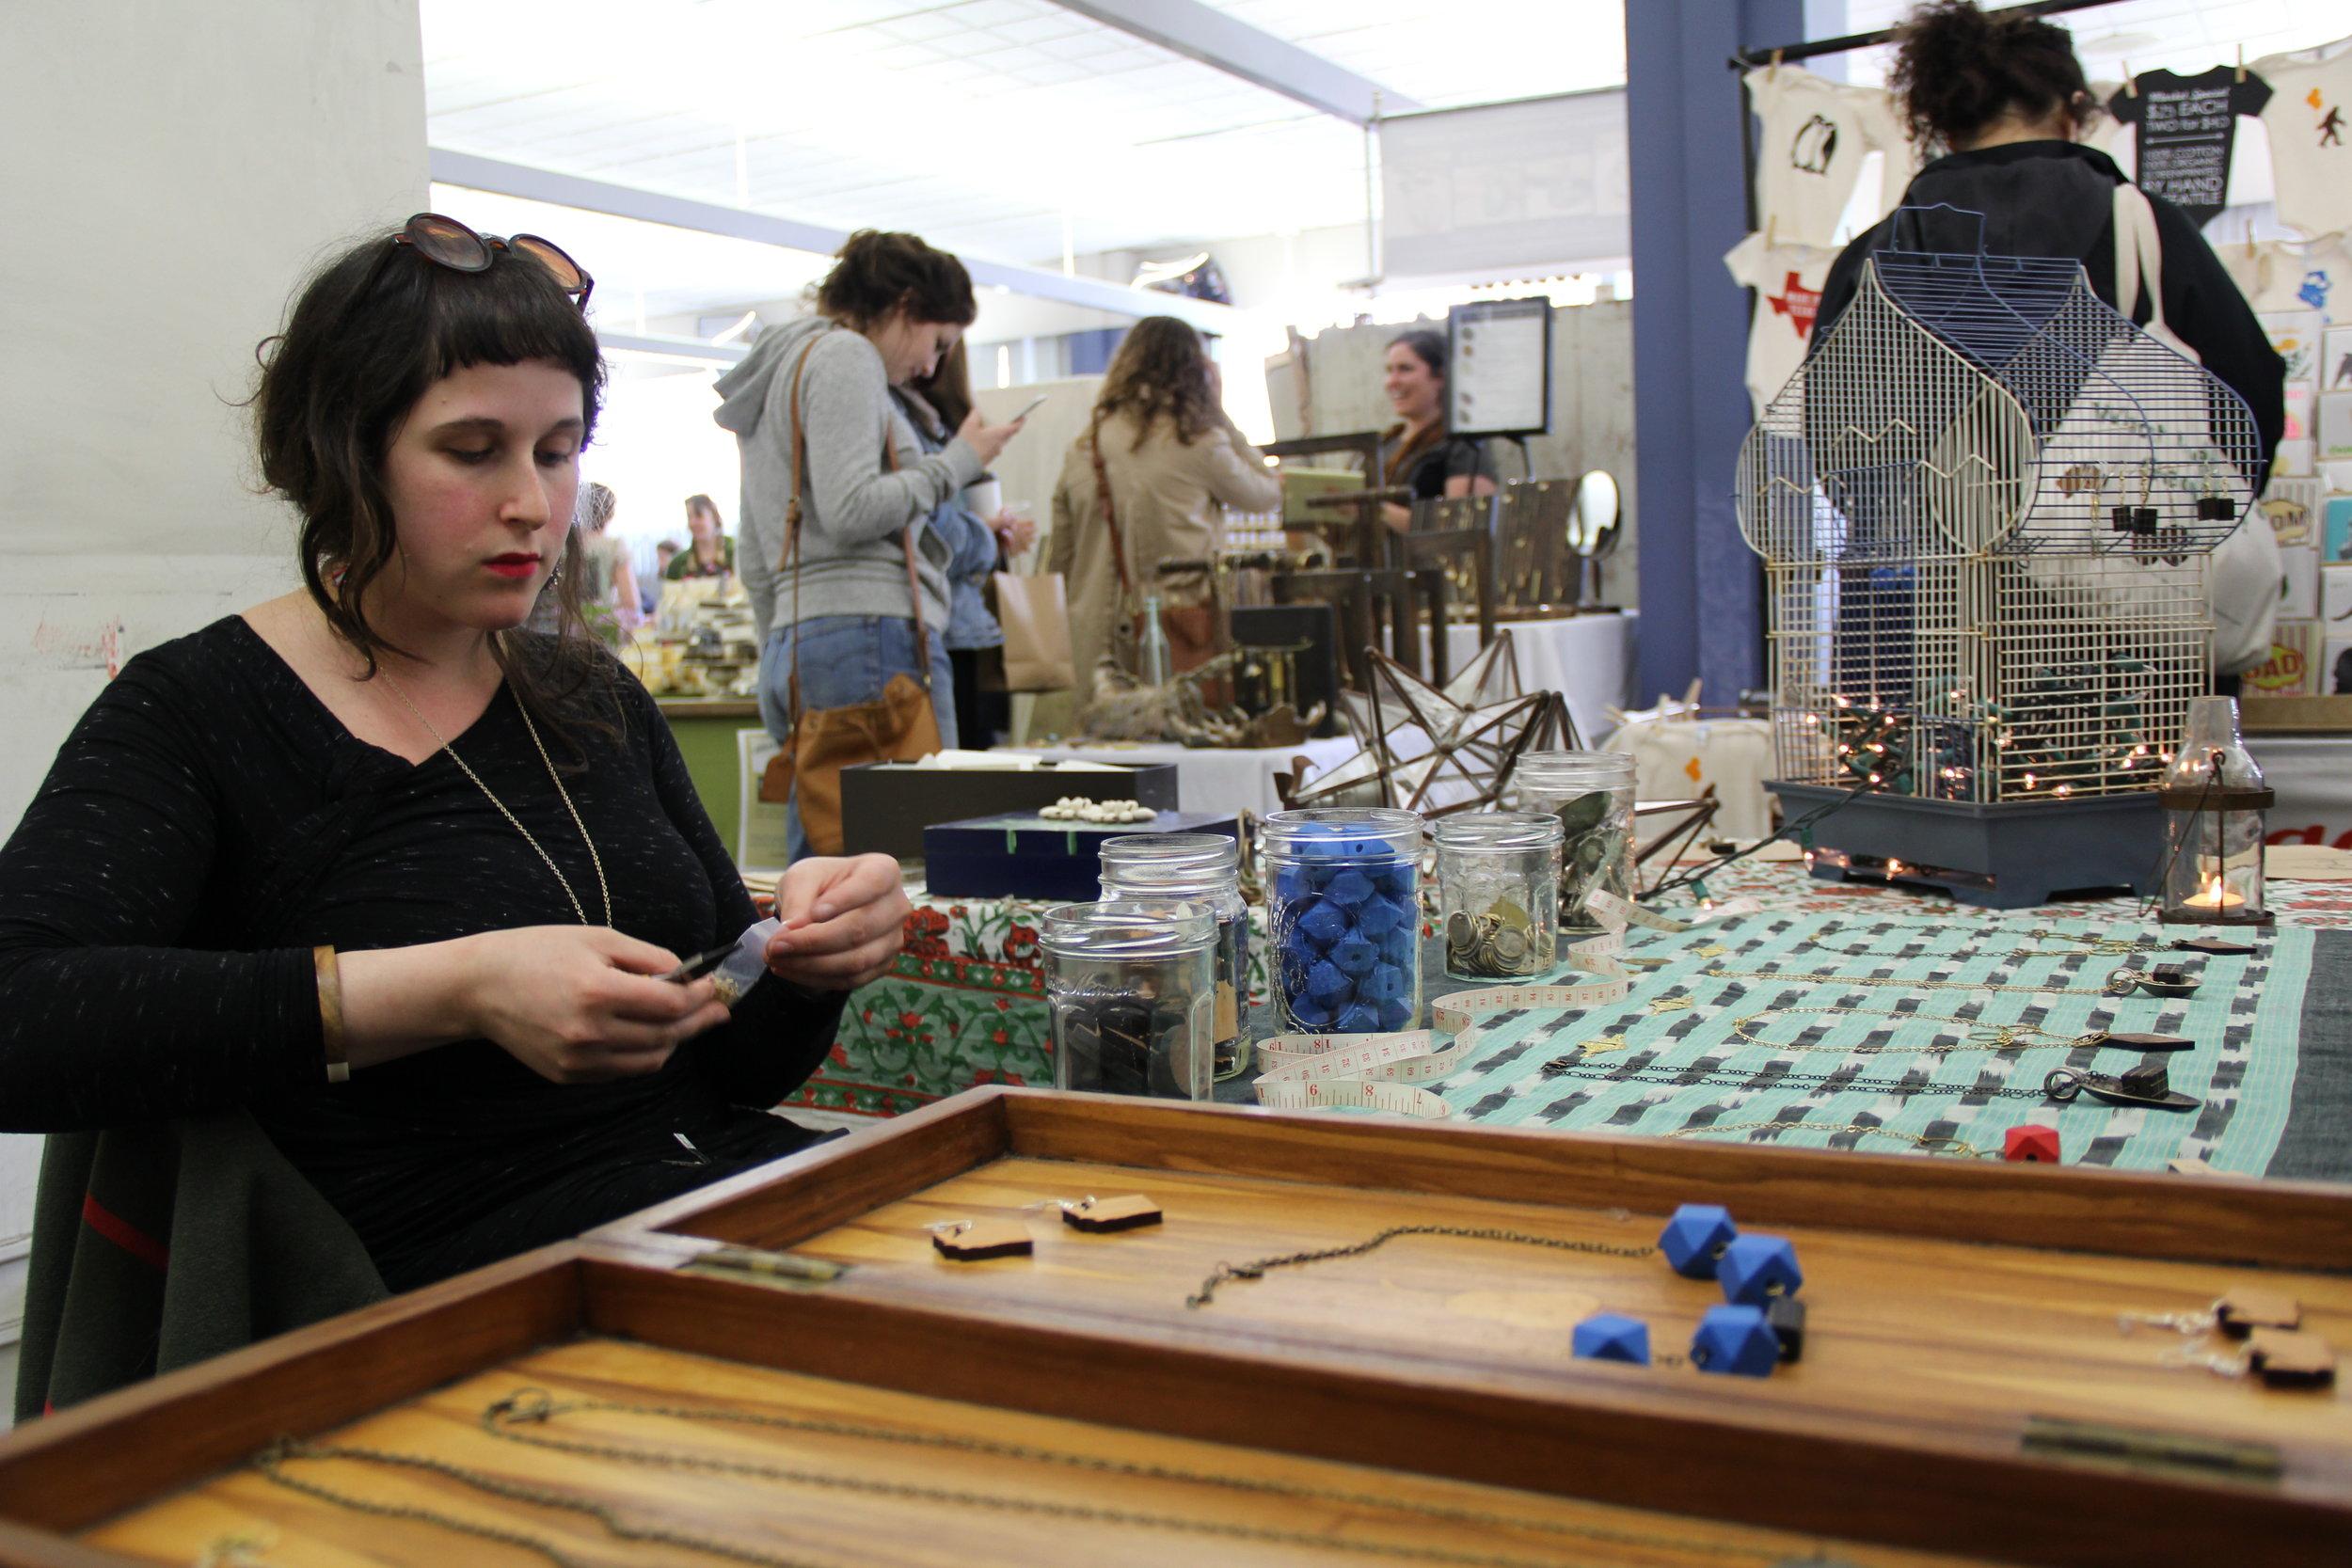 AboutThe Handmade Market Series -